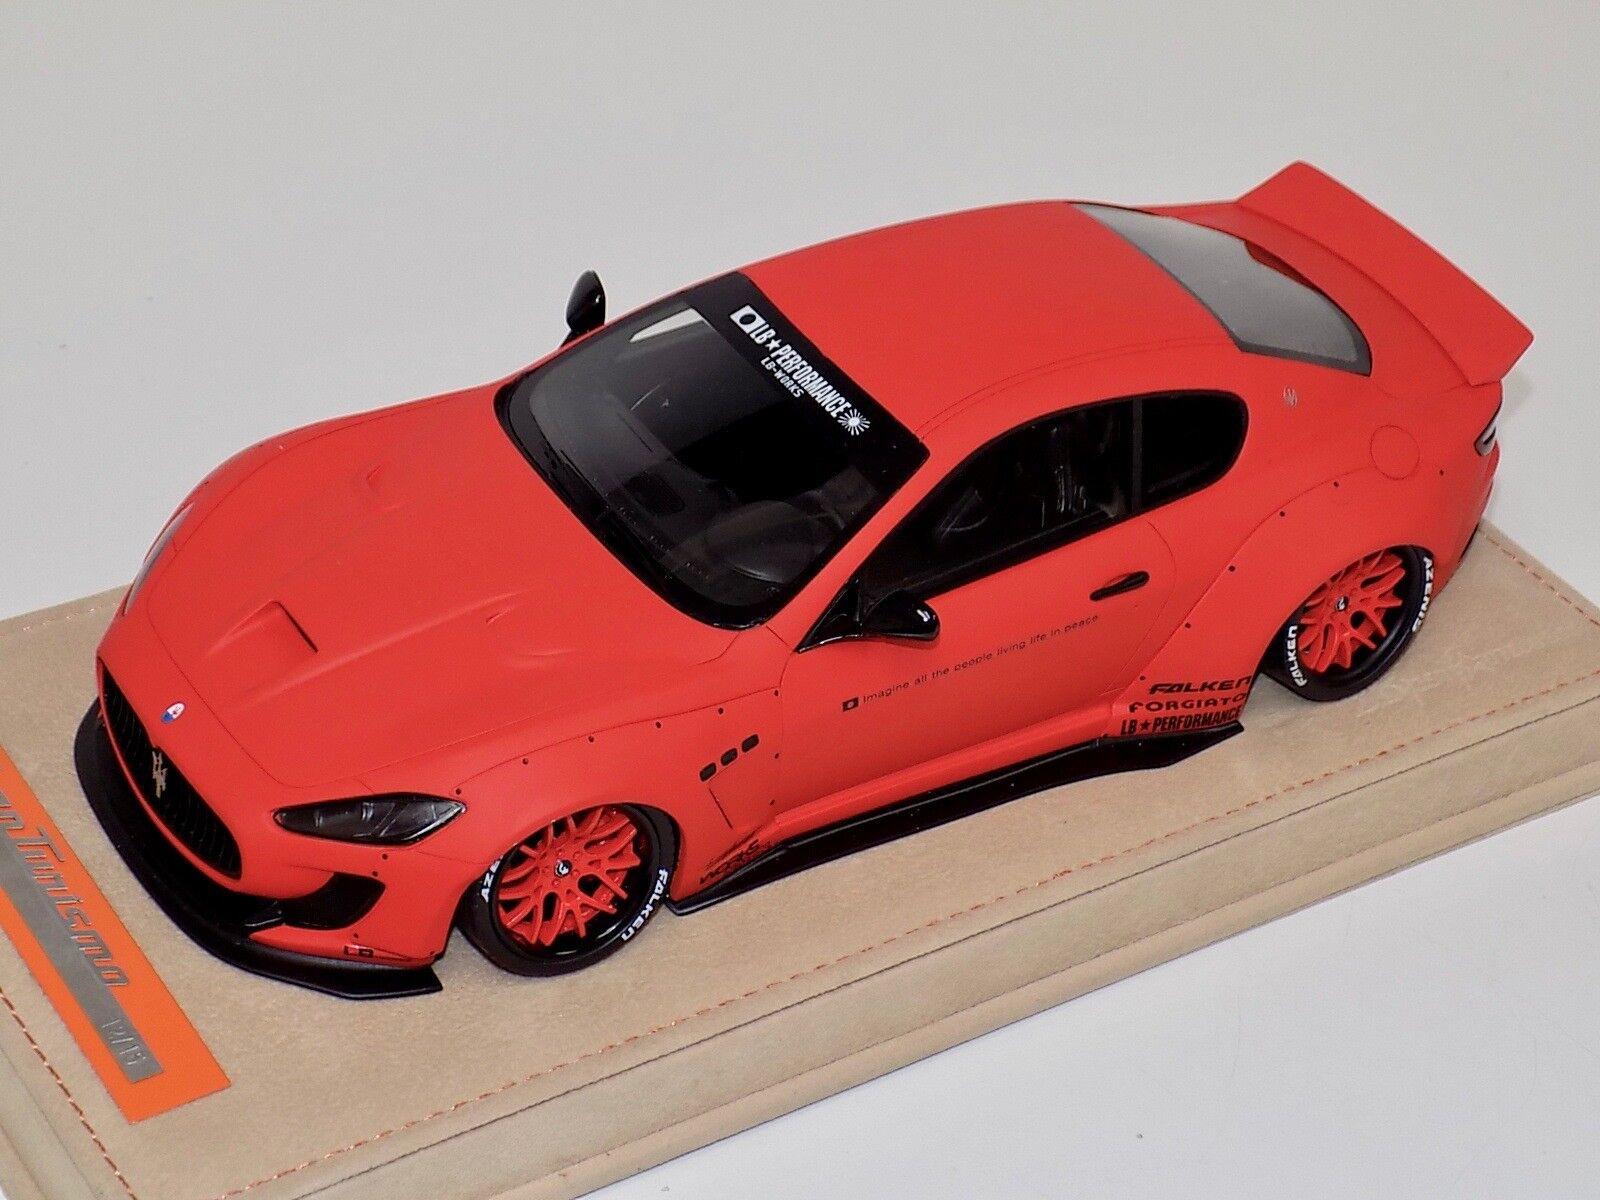 Modelos Maserati GranTurismo Liberty AB caminar mate, naranja de Cromo Alcantara un